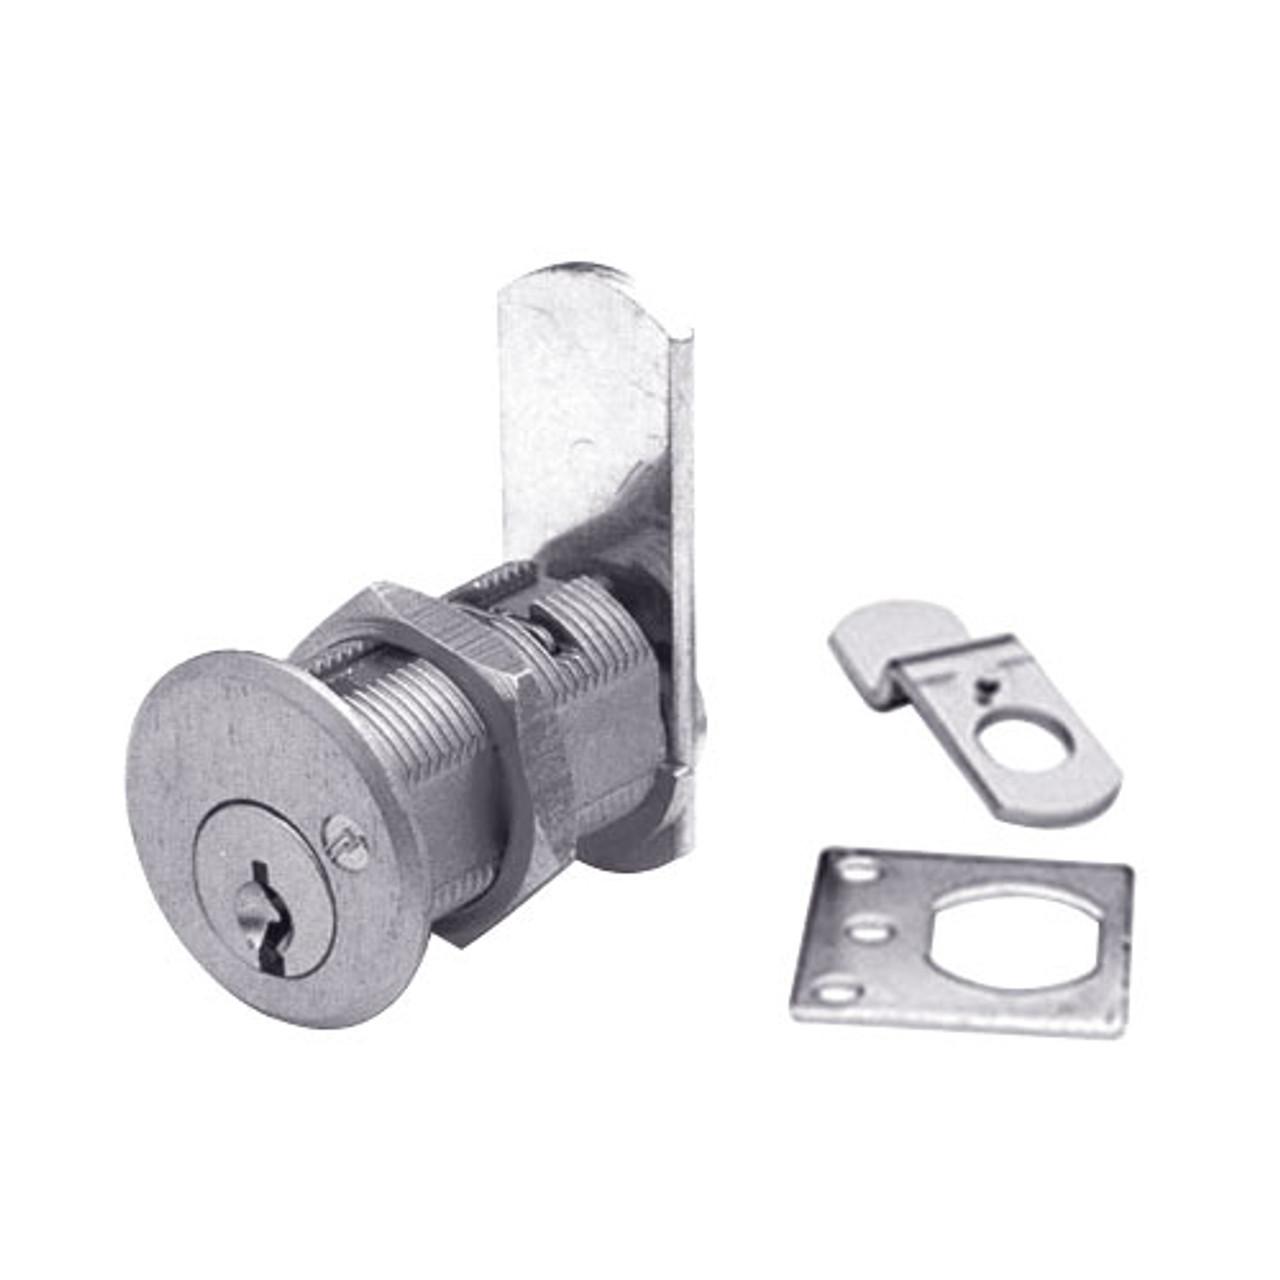 Olympus DCN4-MK-26D Cam Locks in Satin Chrome Finish